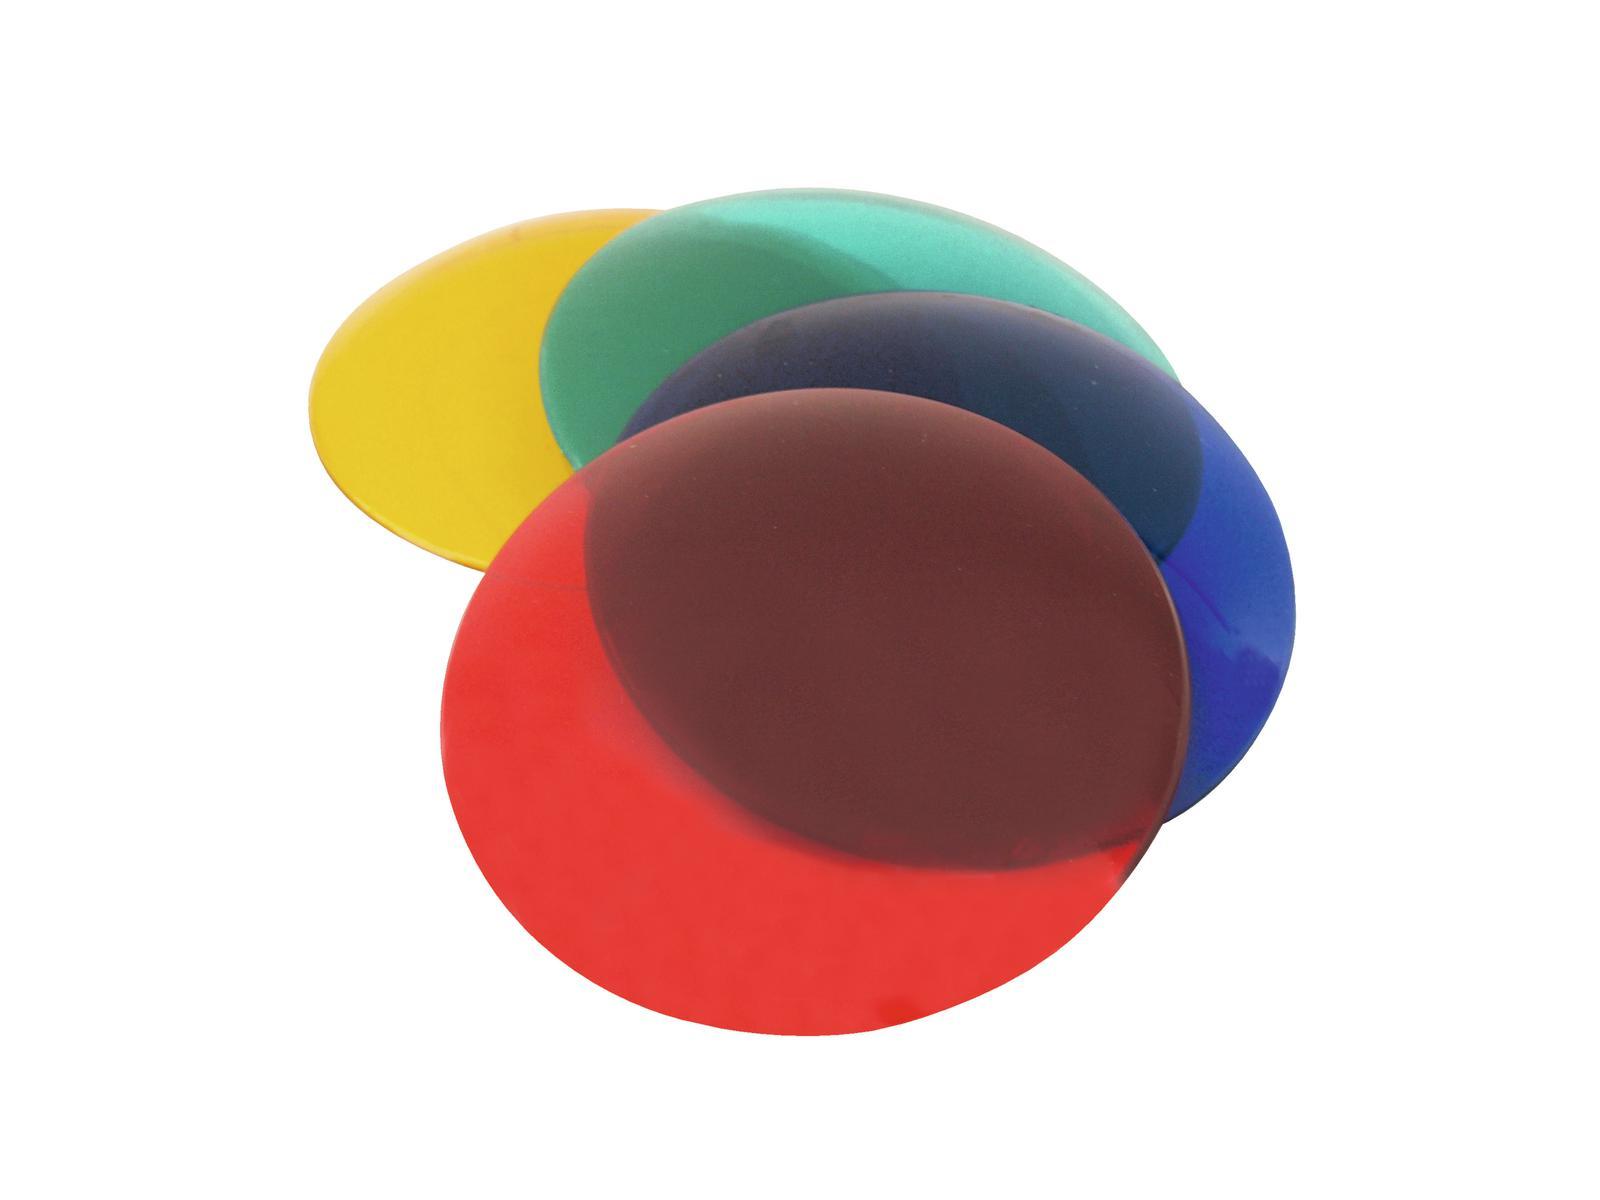 EUROLITE Colore set di tappi per PAR-36, 4 colori